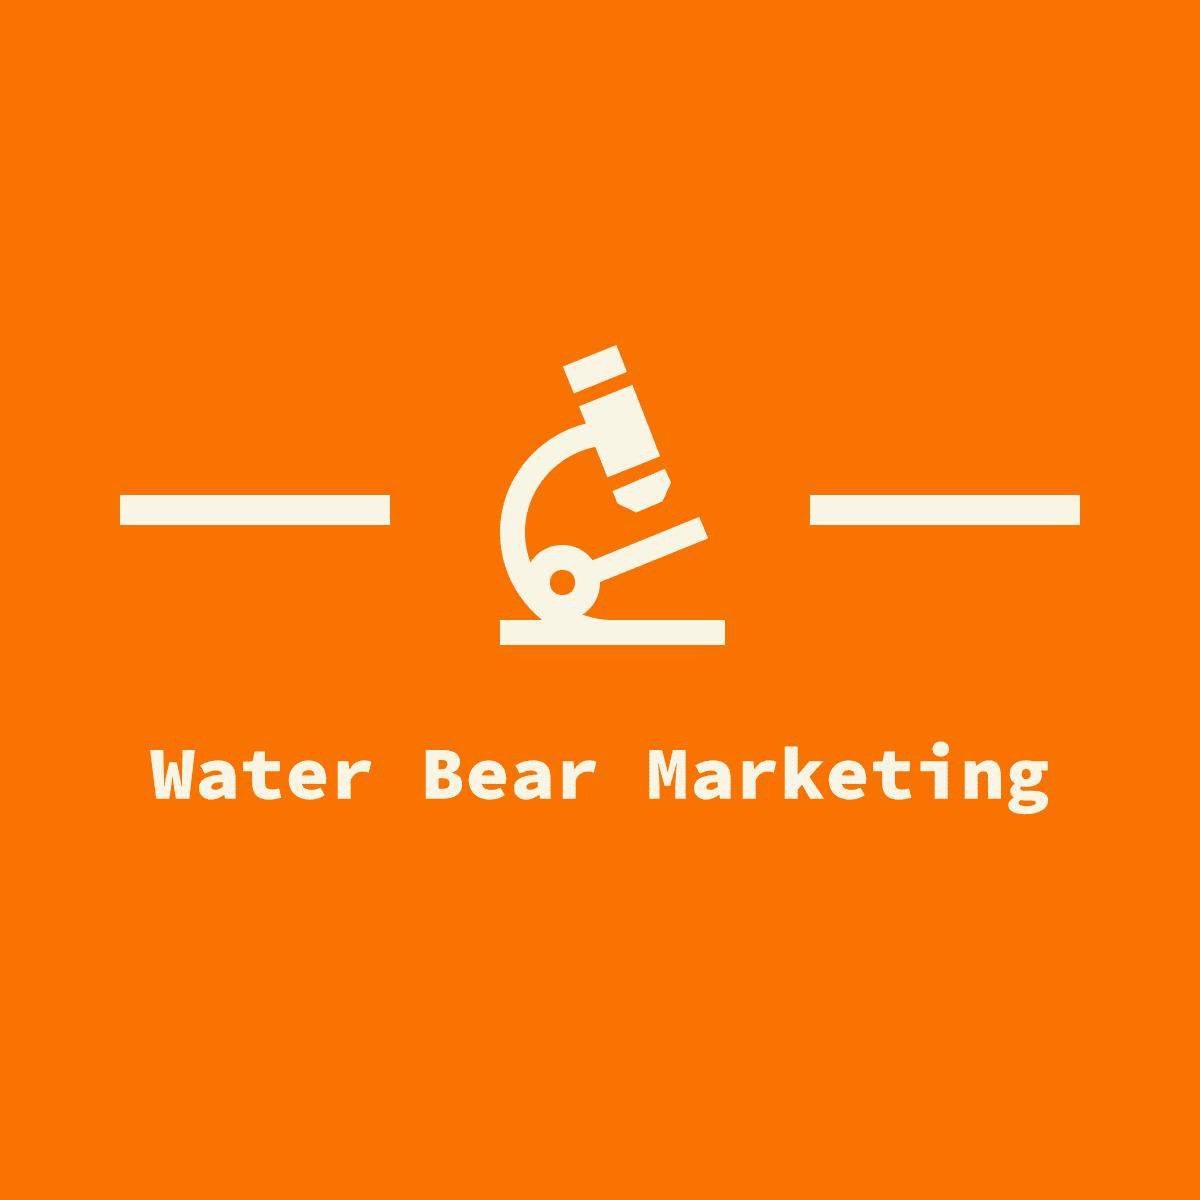 Water Bear Marketing